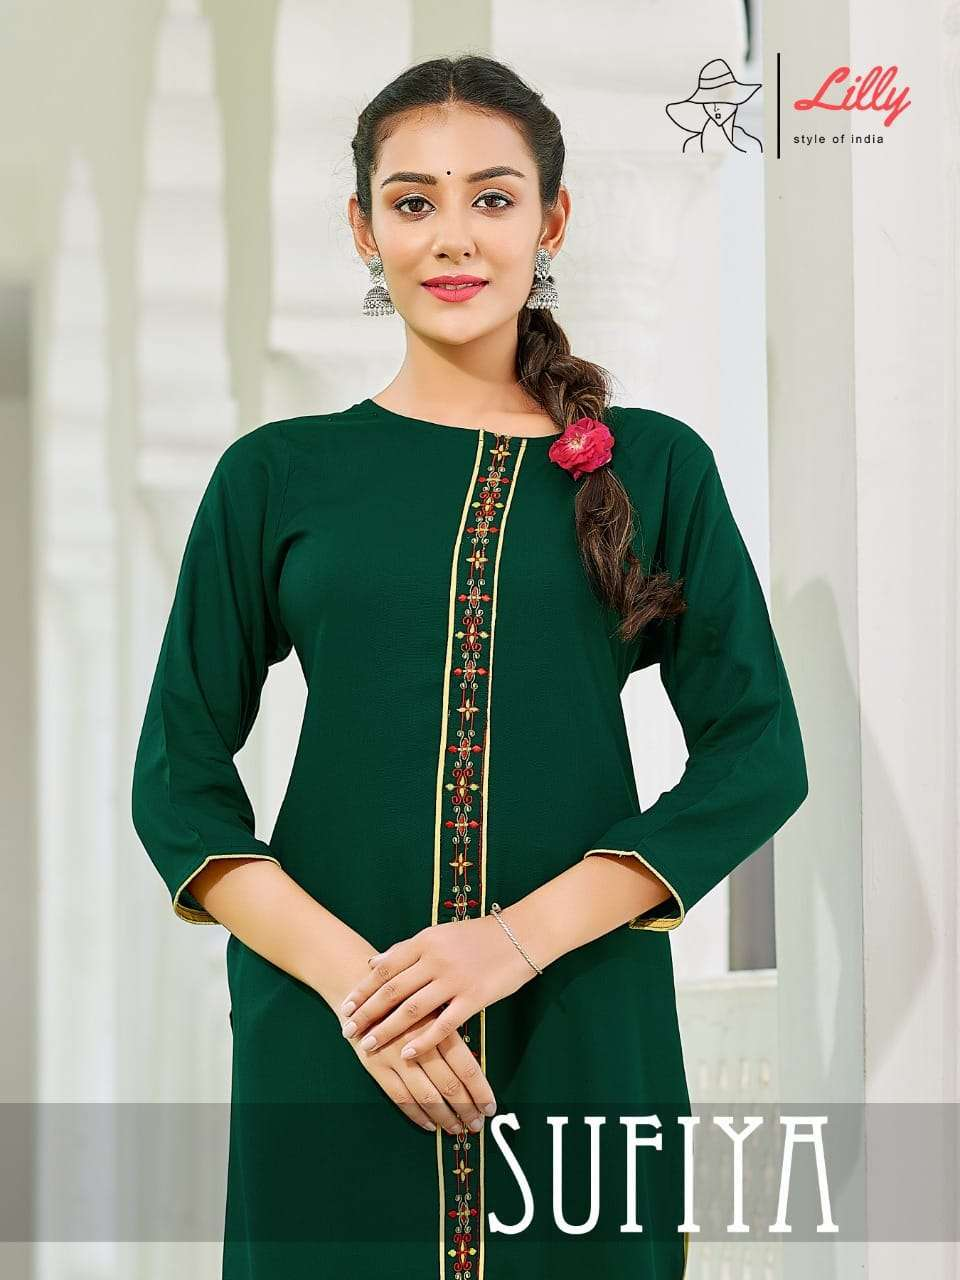 lilly sufiya series 1091-1096 14 kg rayon kurti with pant